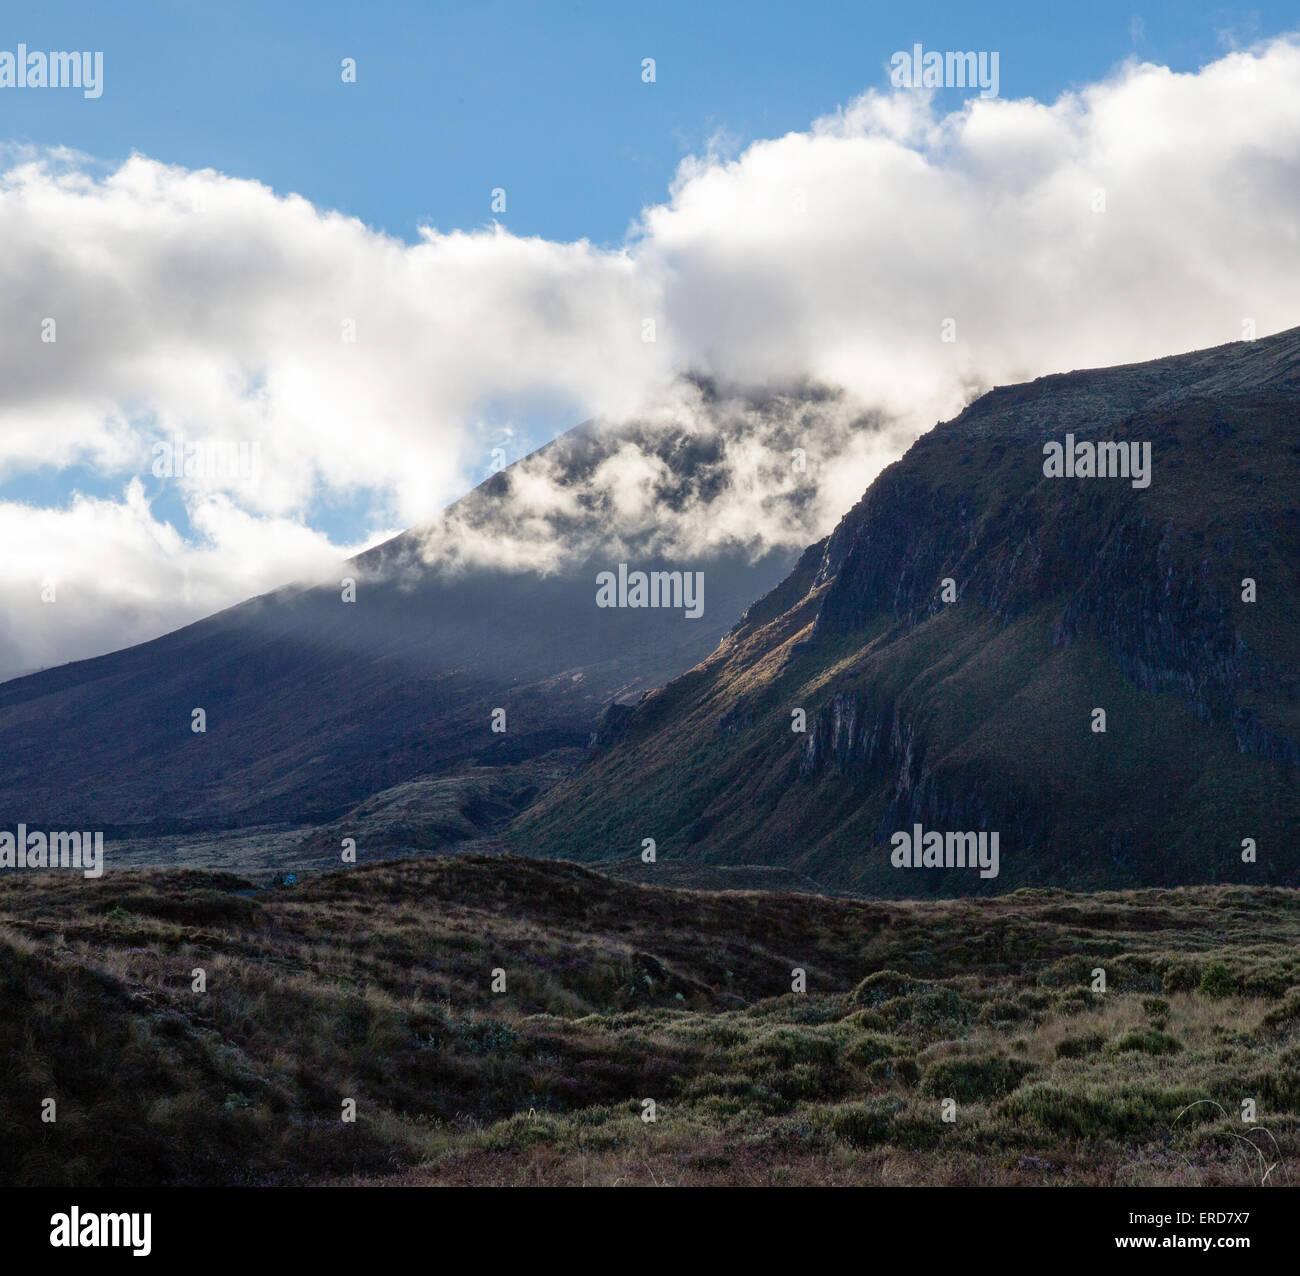 Mount Ngauruhoe shrouded in morning cloud on the Tongariro Alpine Crossing North Island New Zealand - Stock Image